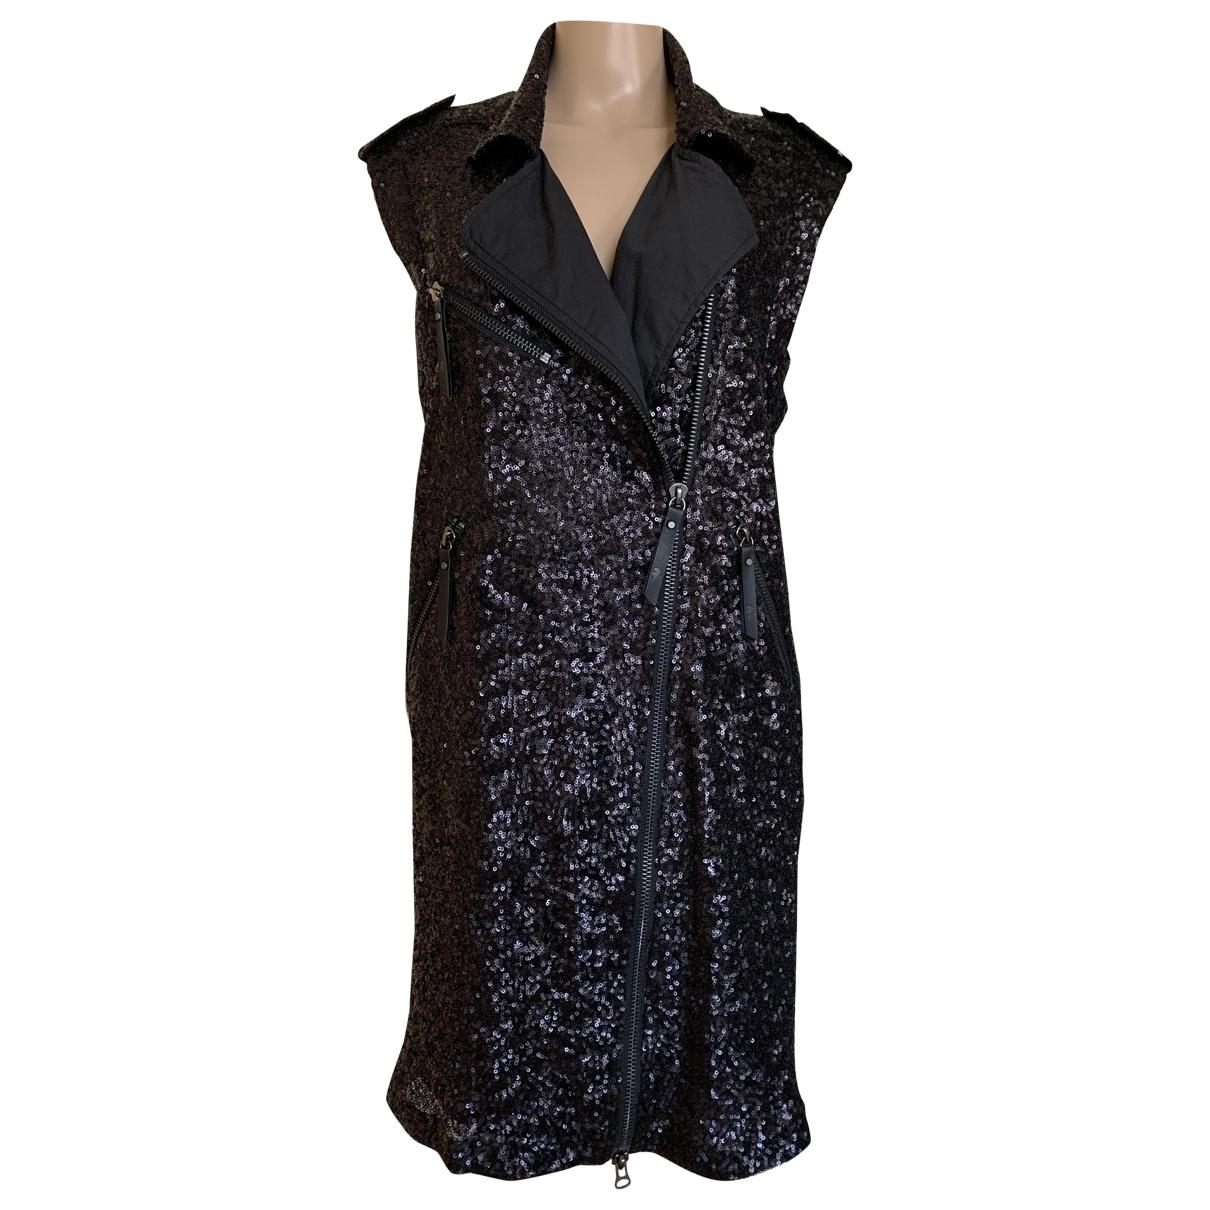 Karl \N Kleid in  Schwarz Polyester